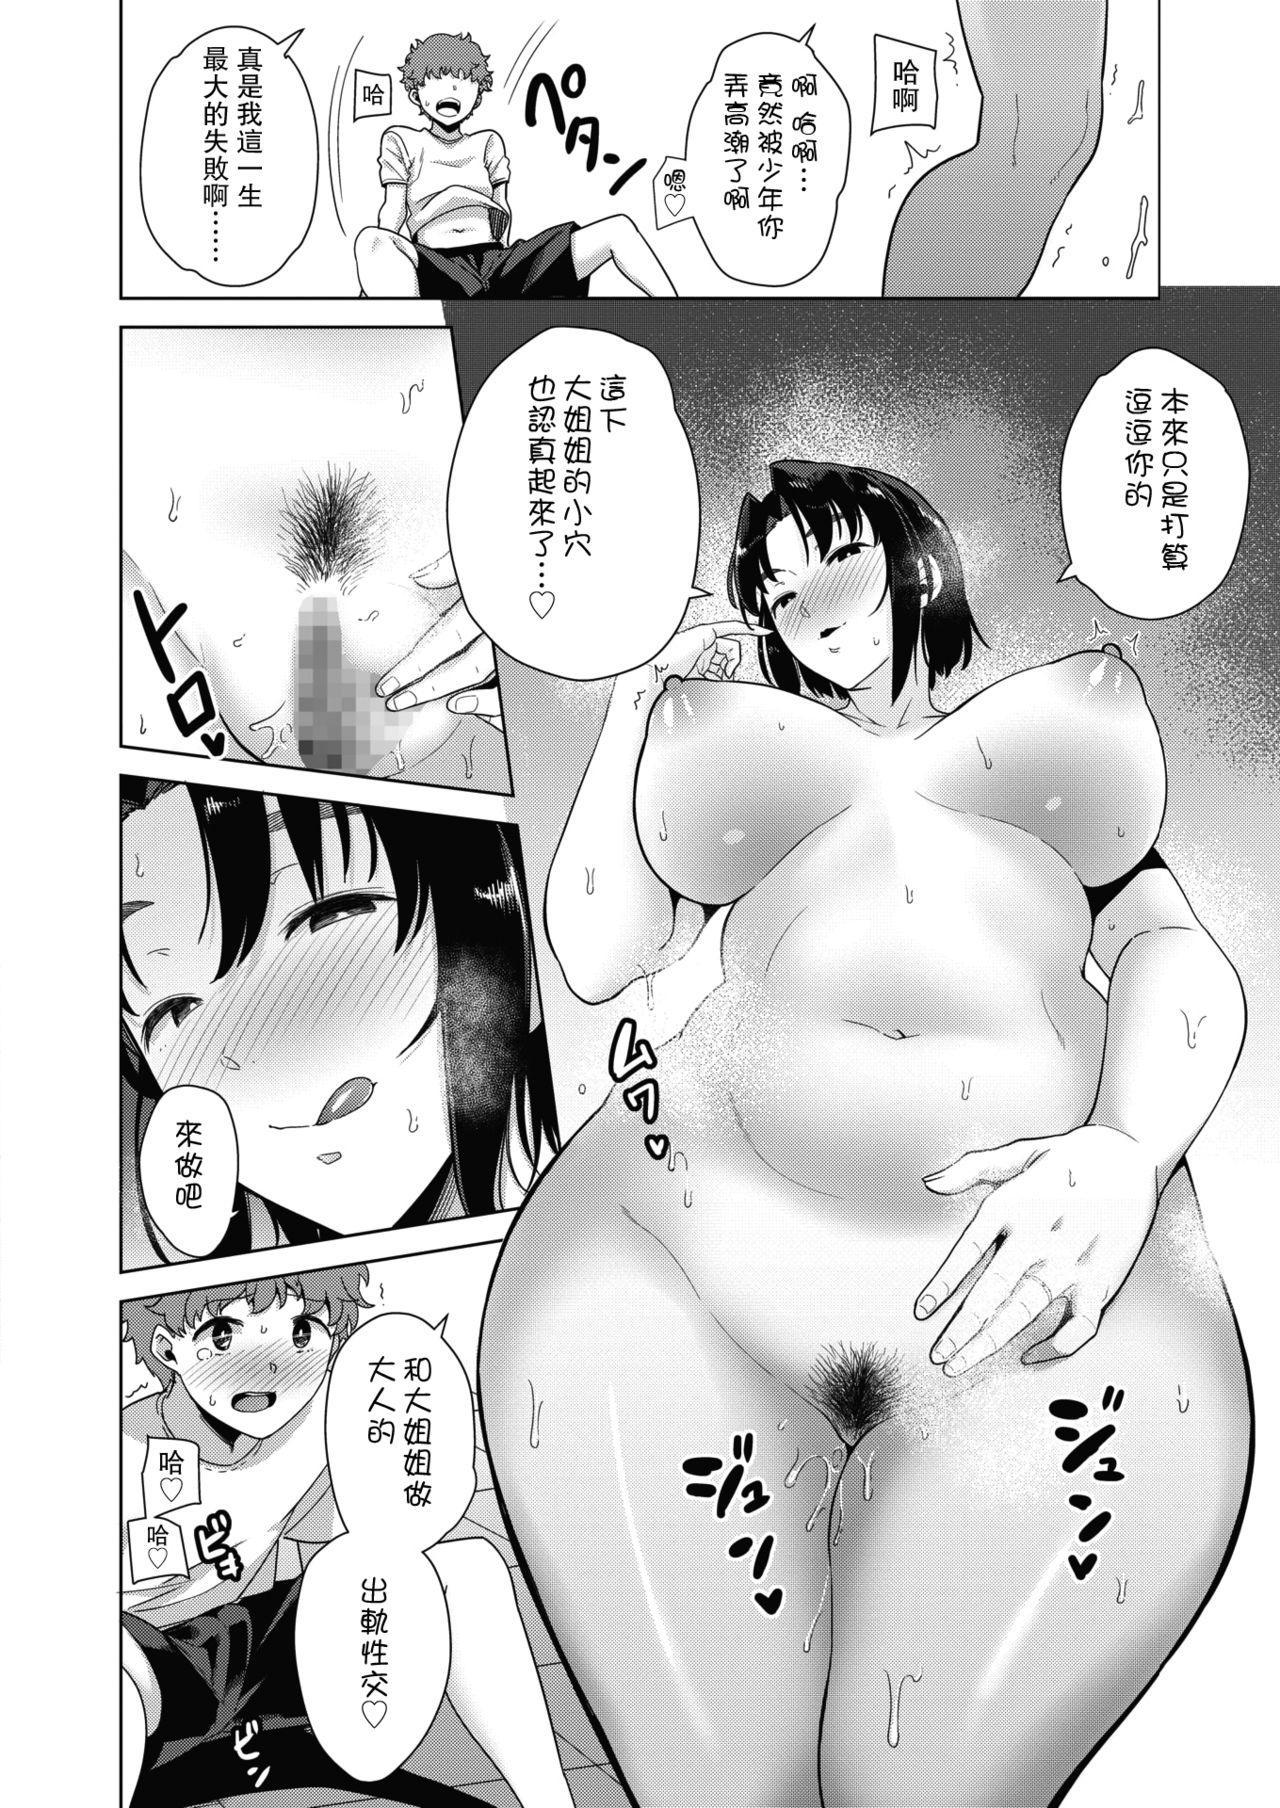 [Kurosu Gatari] Bandai-kun to Onee-san (COMIC HOTMILK 2020-08) [Chinese] [瓜皮汉化] [Digital] 11